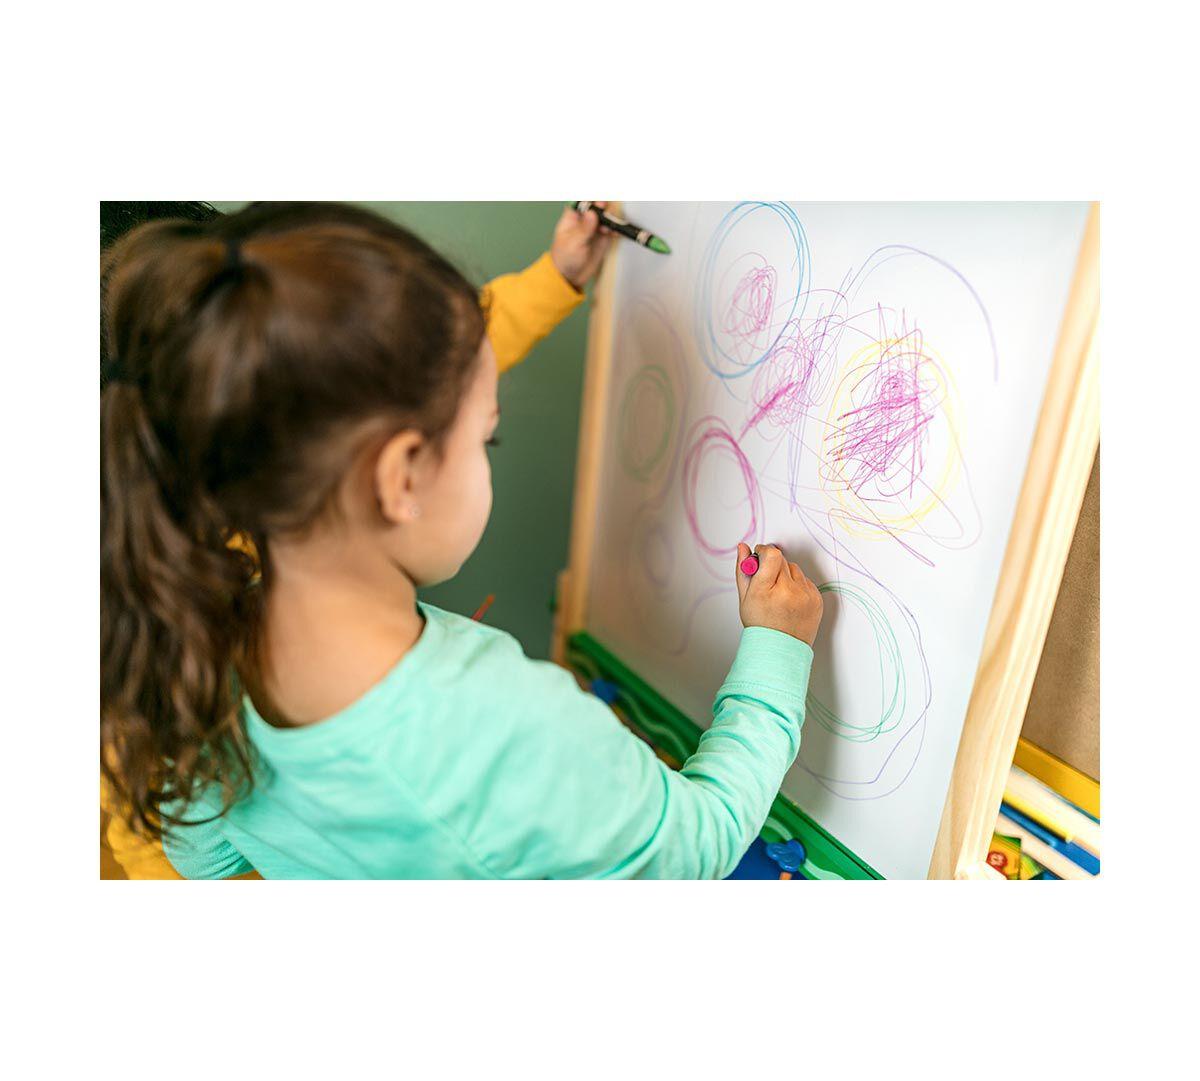 Crayola Kids Wooden Easel Dry Erase Board Chalkboard Gift For Kids Age 4567 Crayola